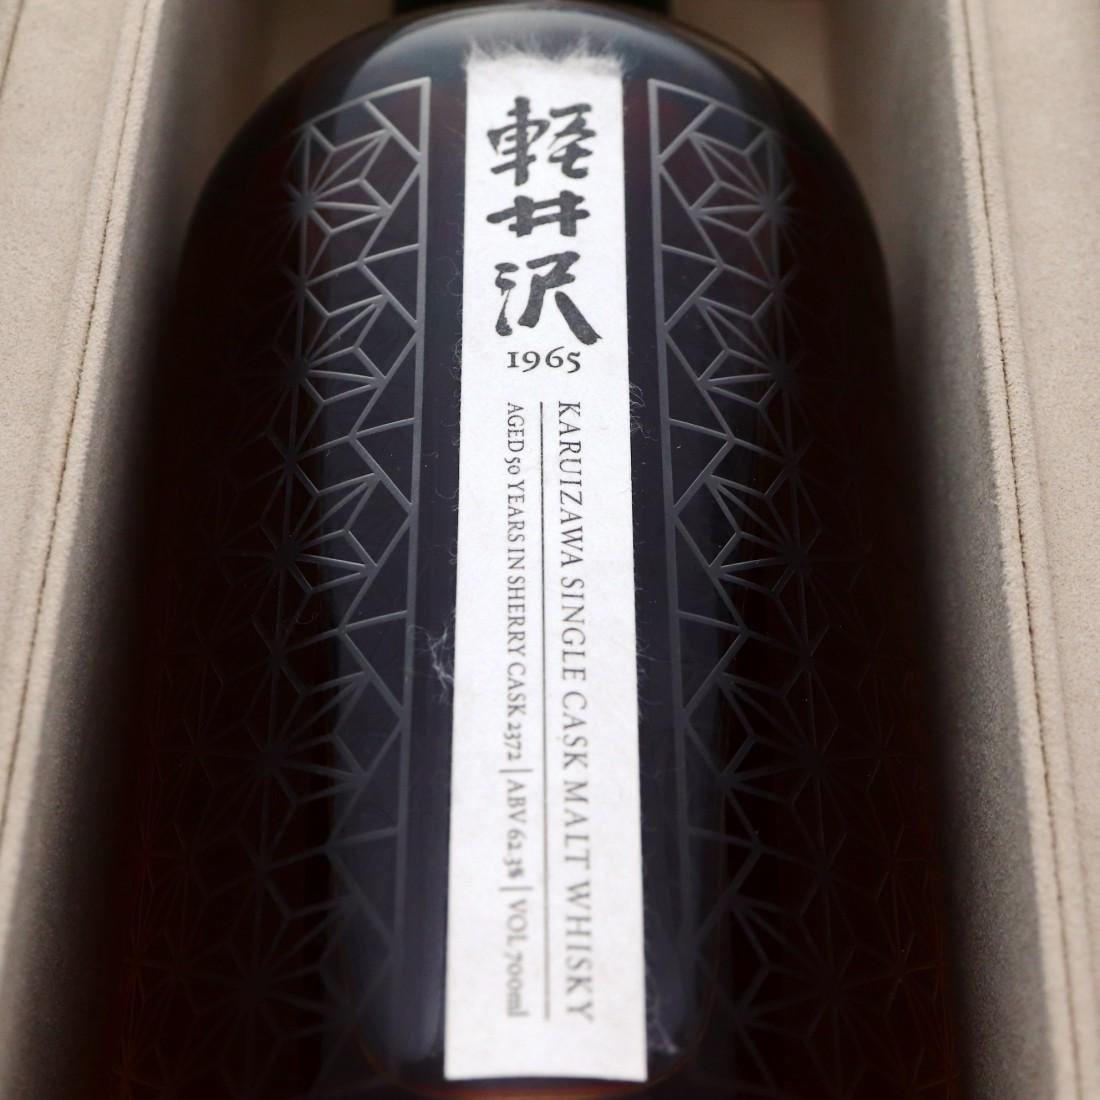 Karuizawa 1965 Single Sherry Cask 50 Year Old #2372 / LMDW